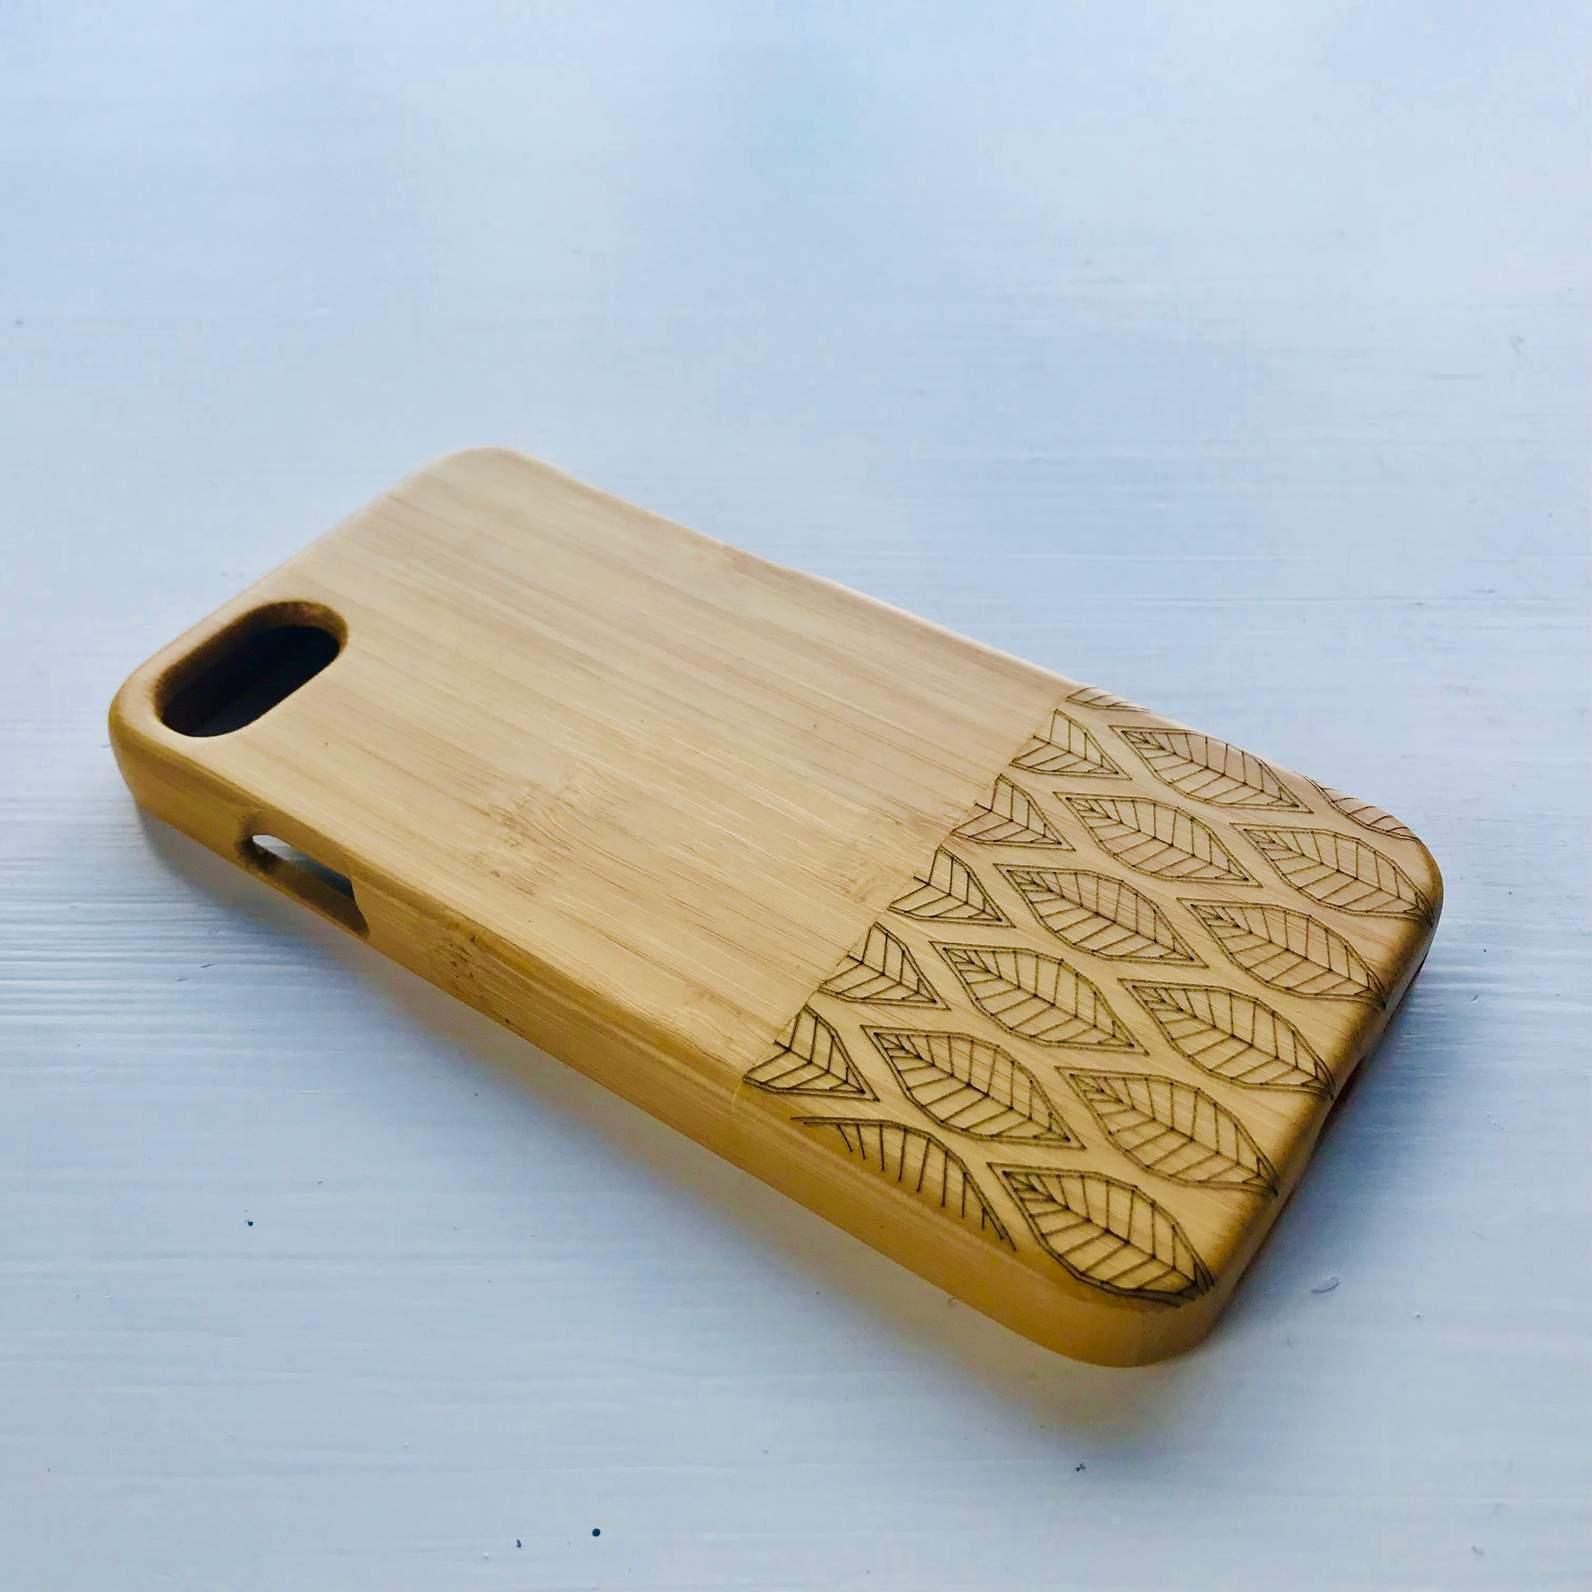 iphone 7 case felt